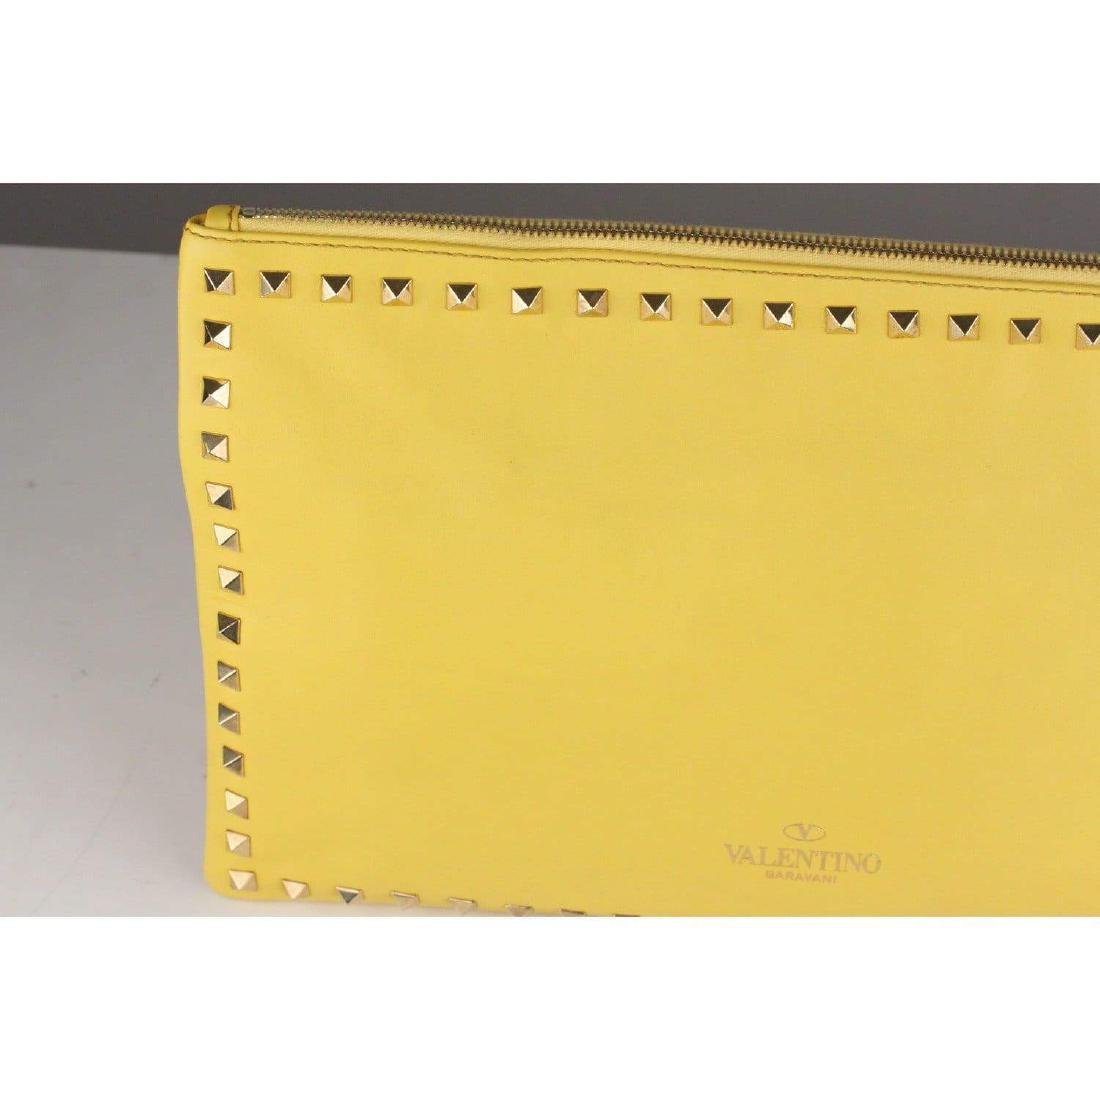 Valentino Rockstud Large Clutch Wrist Bag - 5